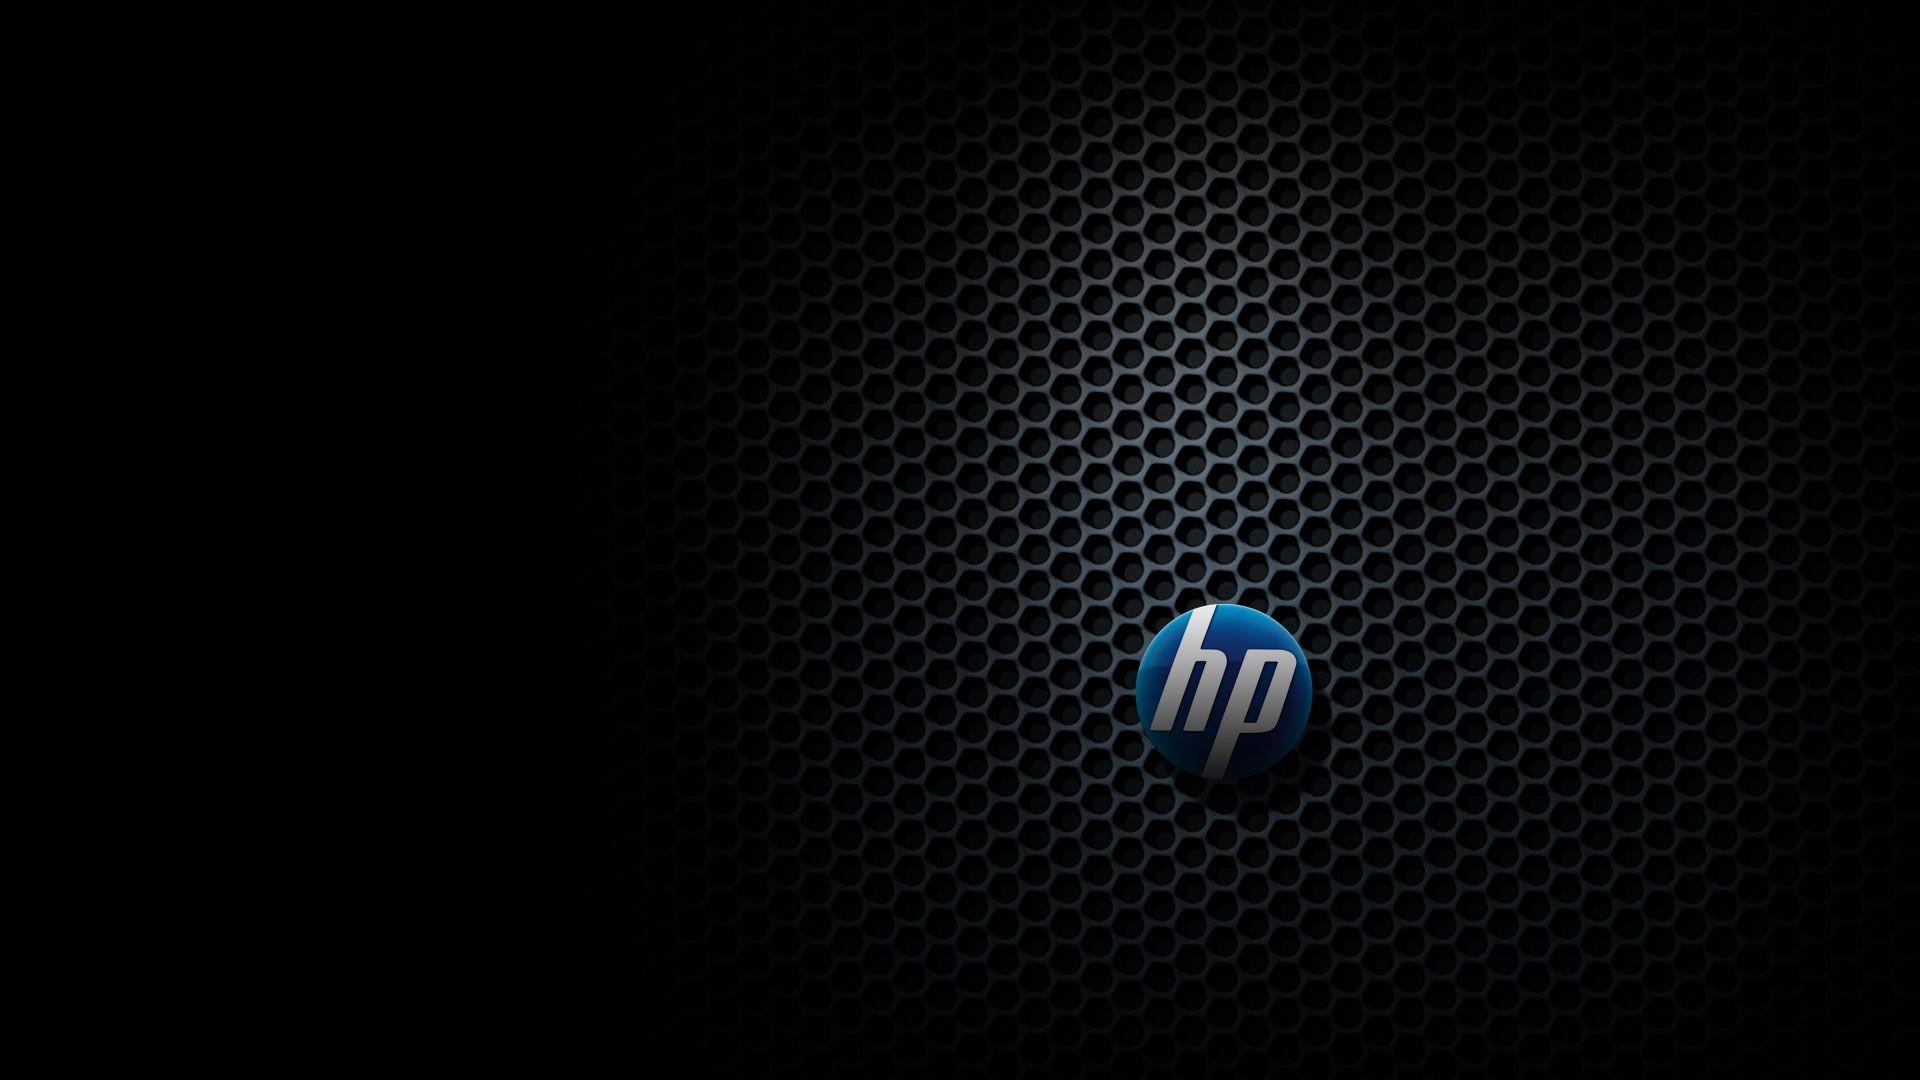 Hp Wallpaper 1366x768 1